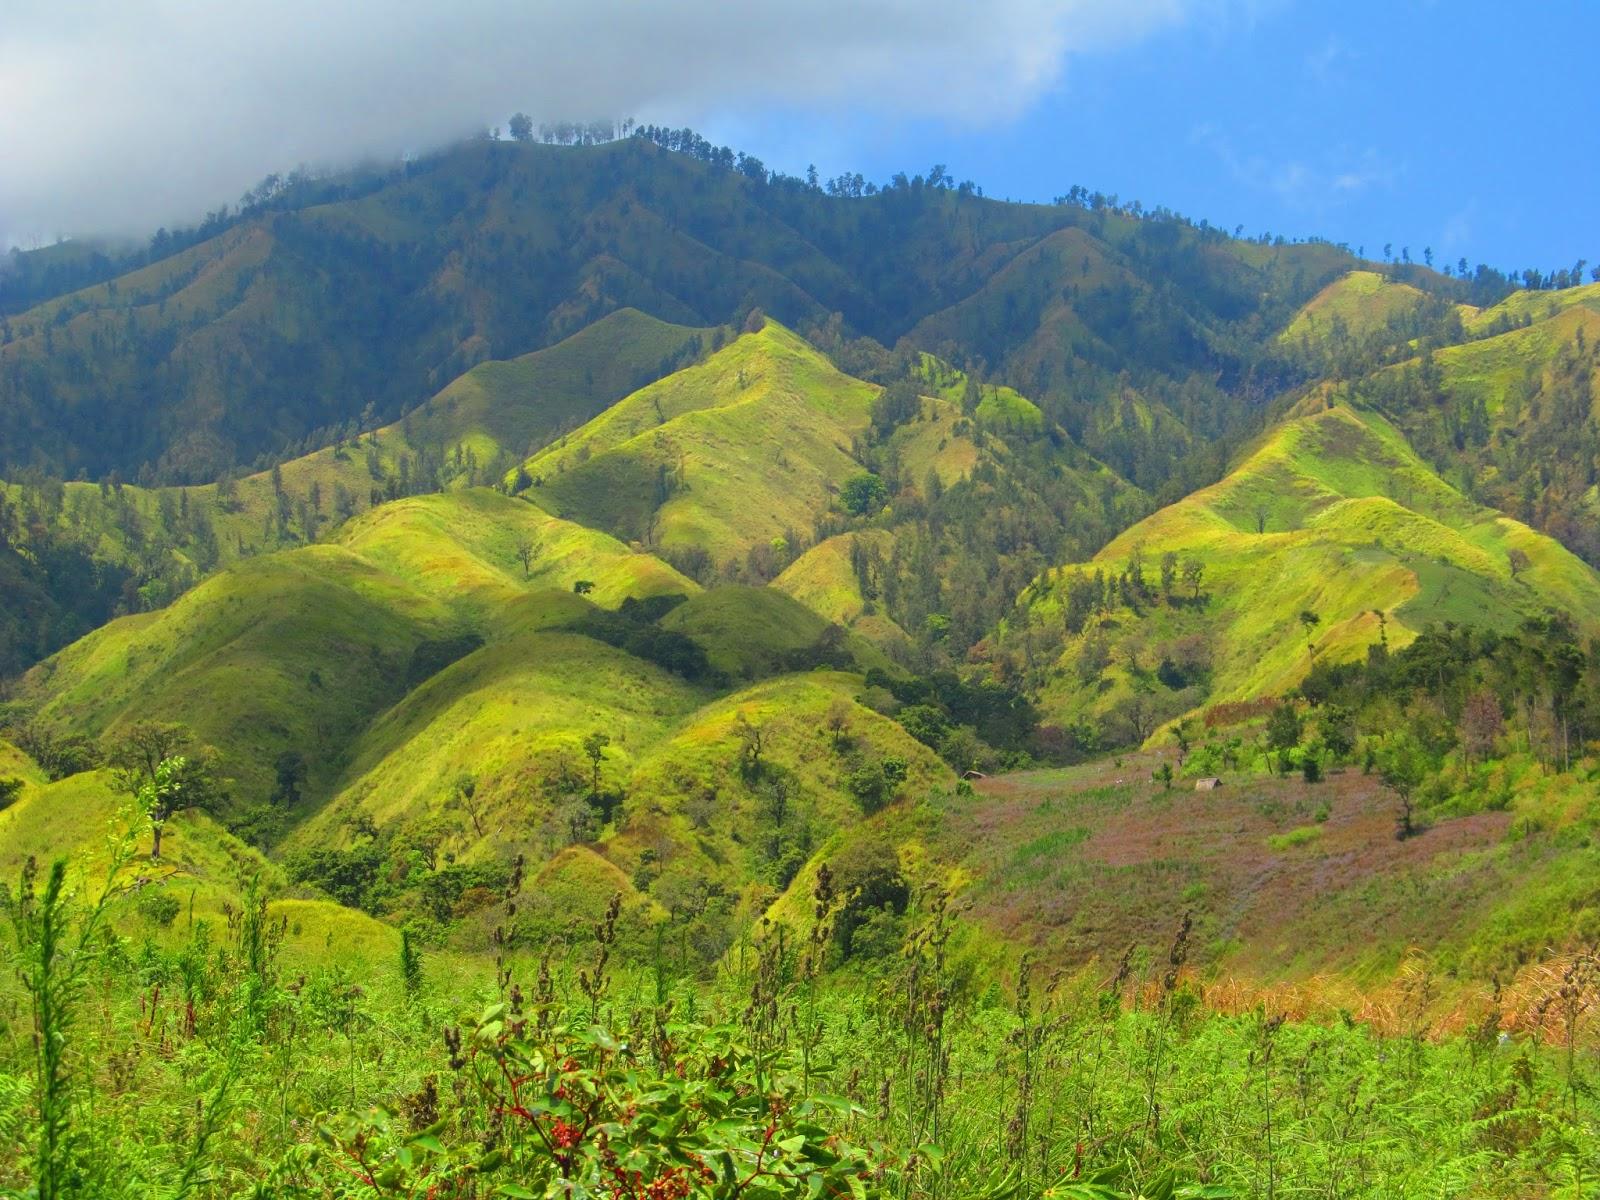 Taman Galuh Surga Tersembunyi Kaki Gunung Crengih Gus Bolang Membahas